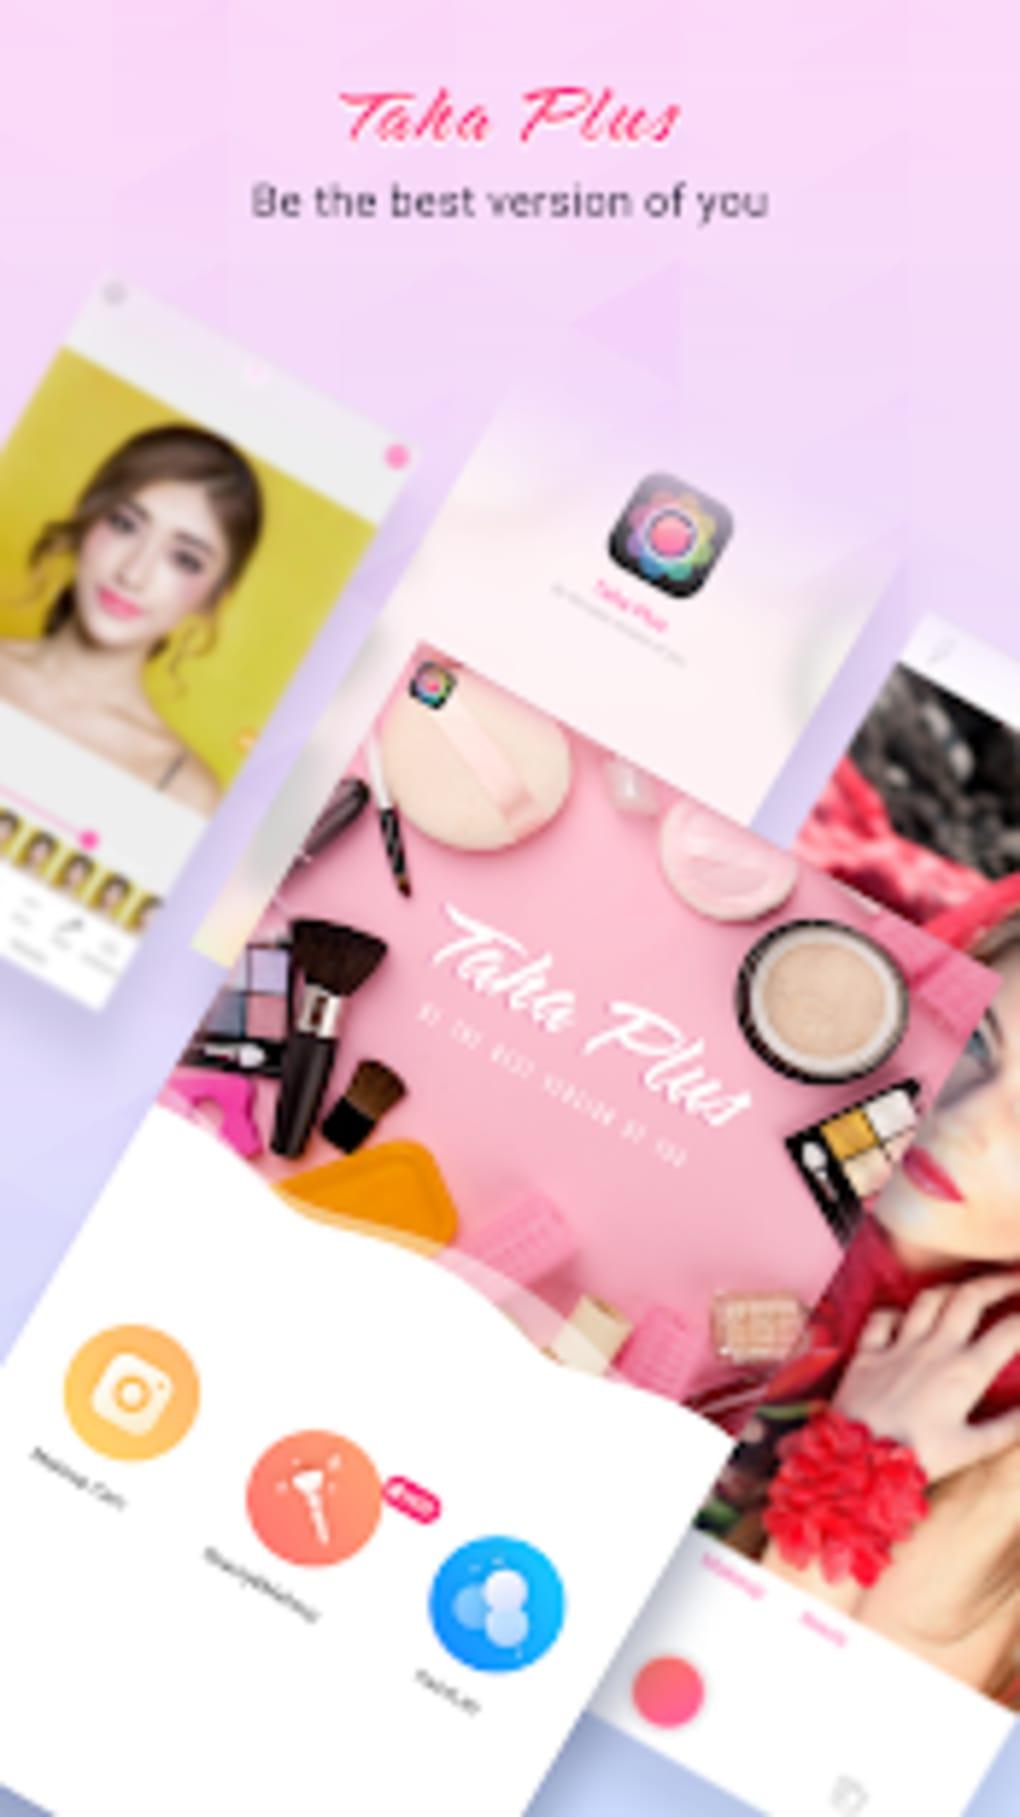 Taha Plus Face Makeup Camera Photo Makeup Editor for Android